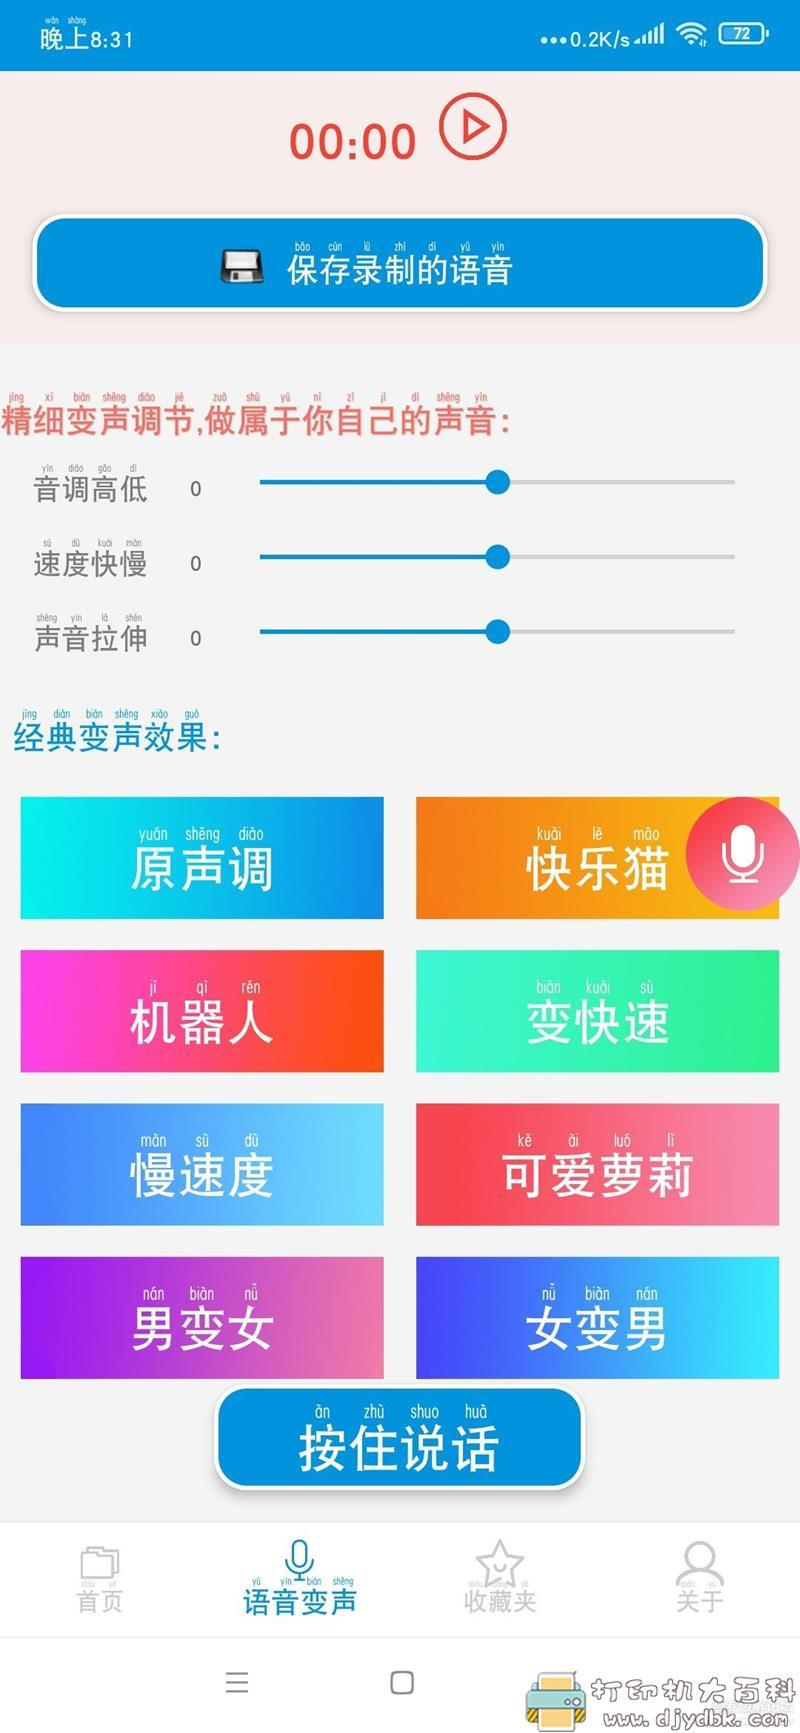 [Android]万能语音包变声器1.1.10解锁付费版图片 No.1